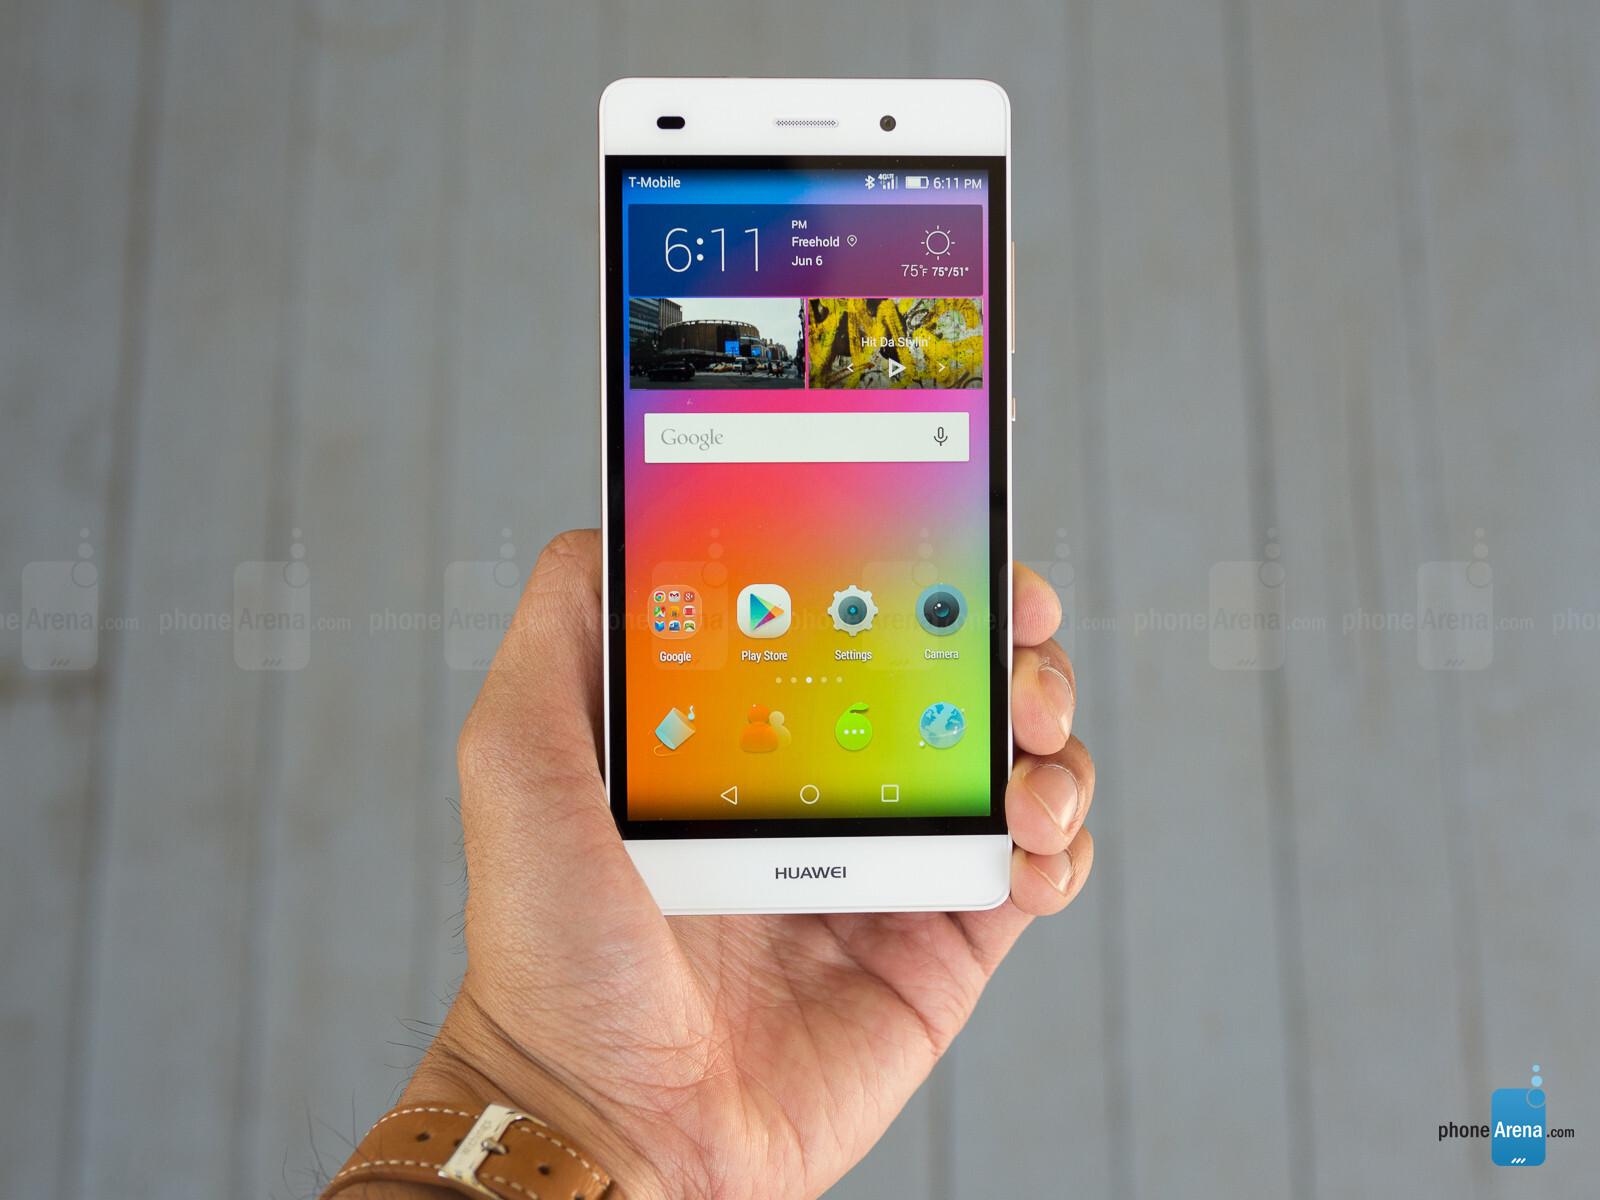 huawei p8 lite vs iphone 6. huawei p8 lite vs iphone 6 d